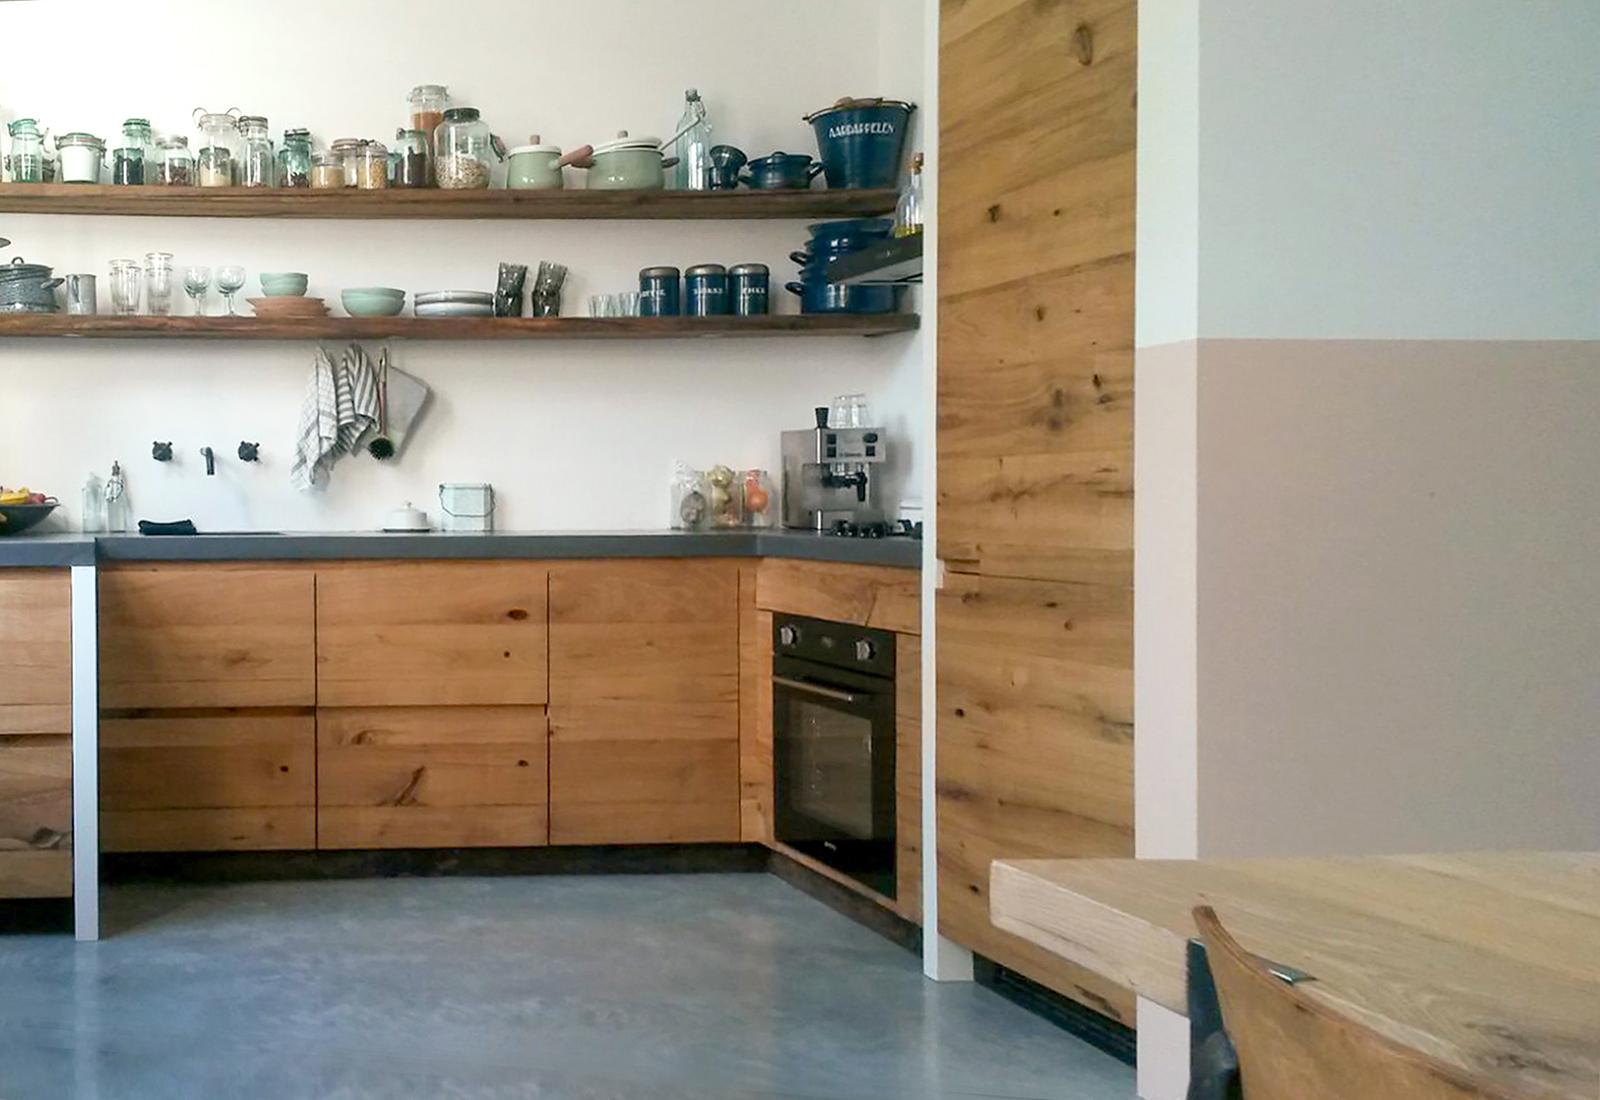 Keuken van oude eiken wagondelen